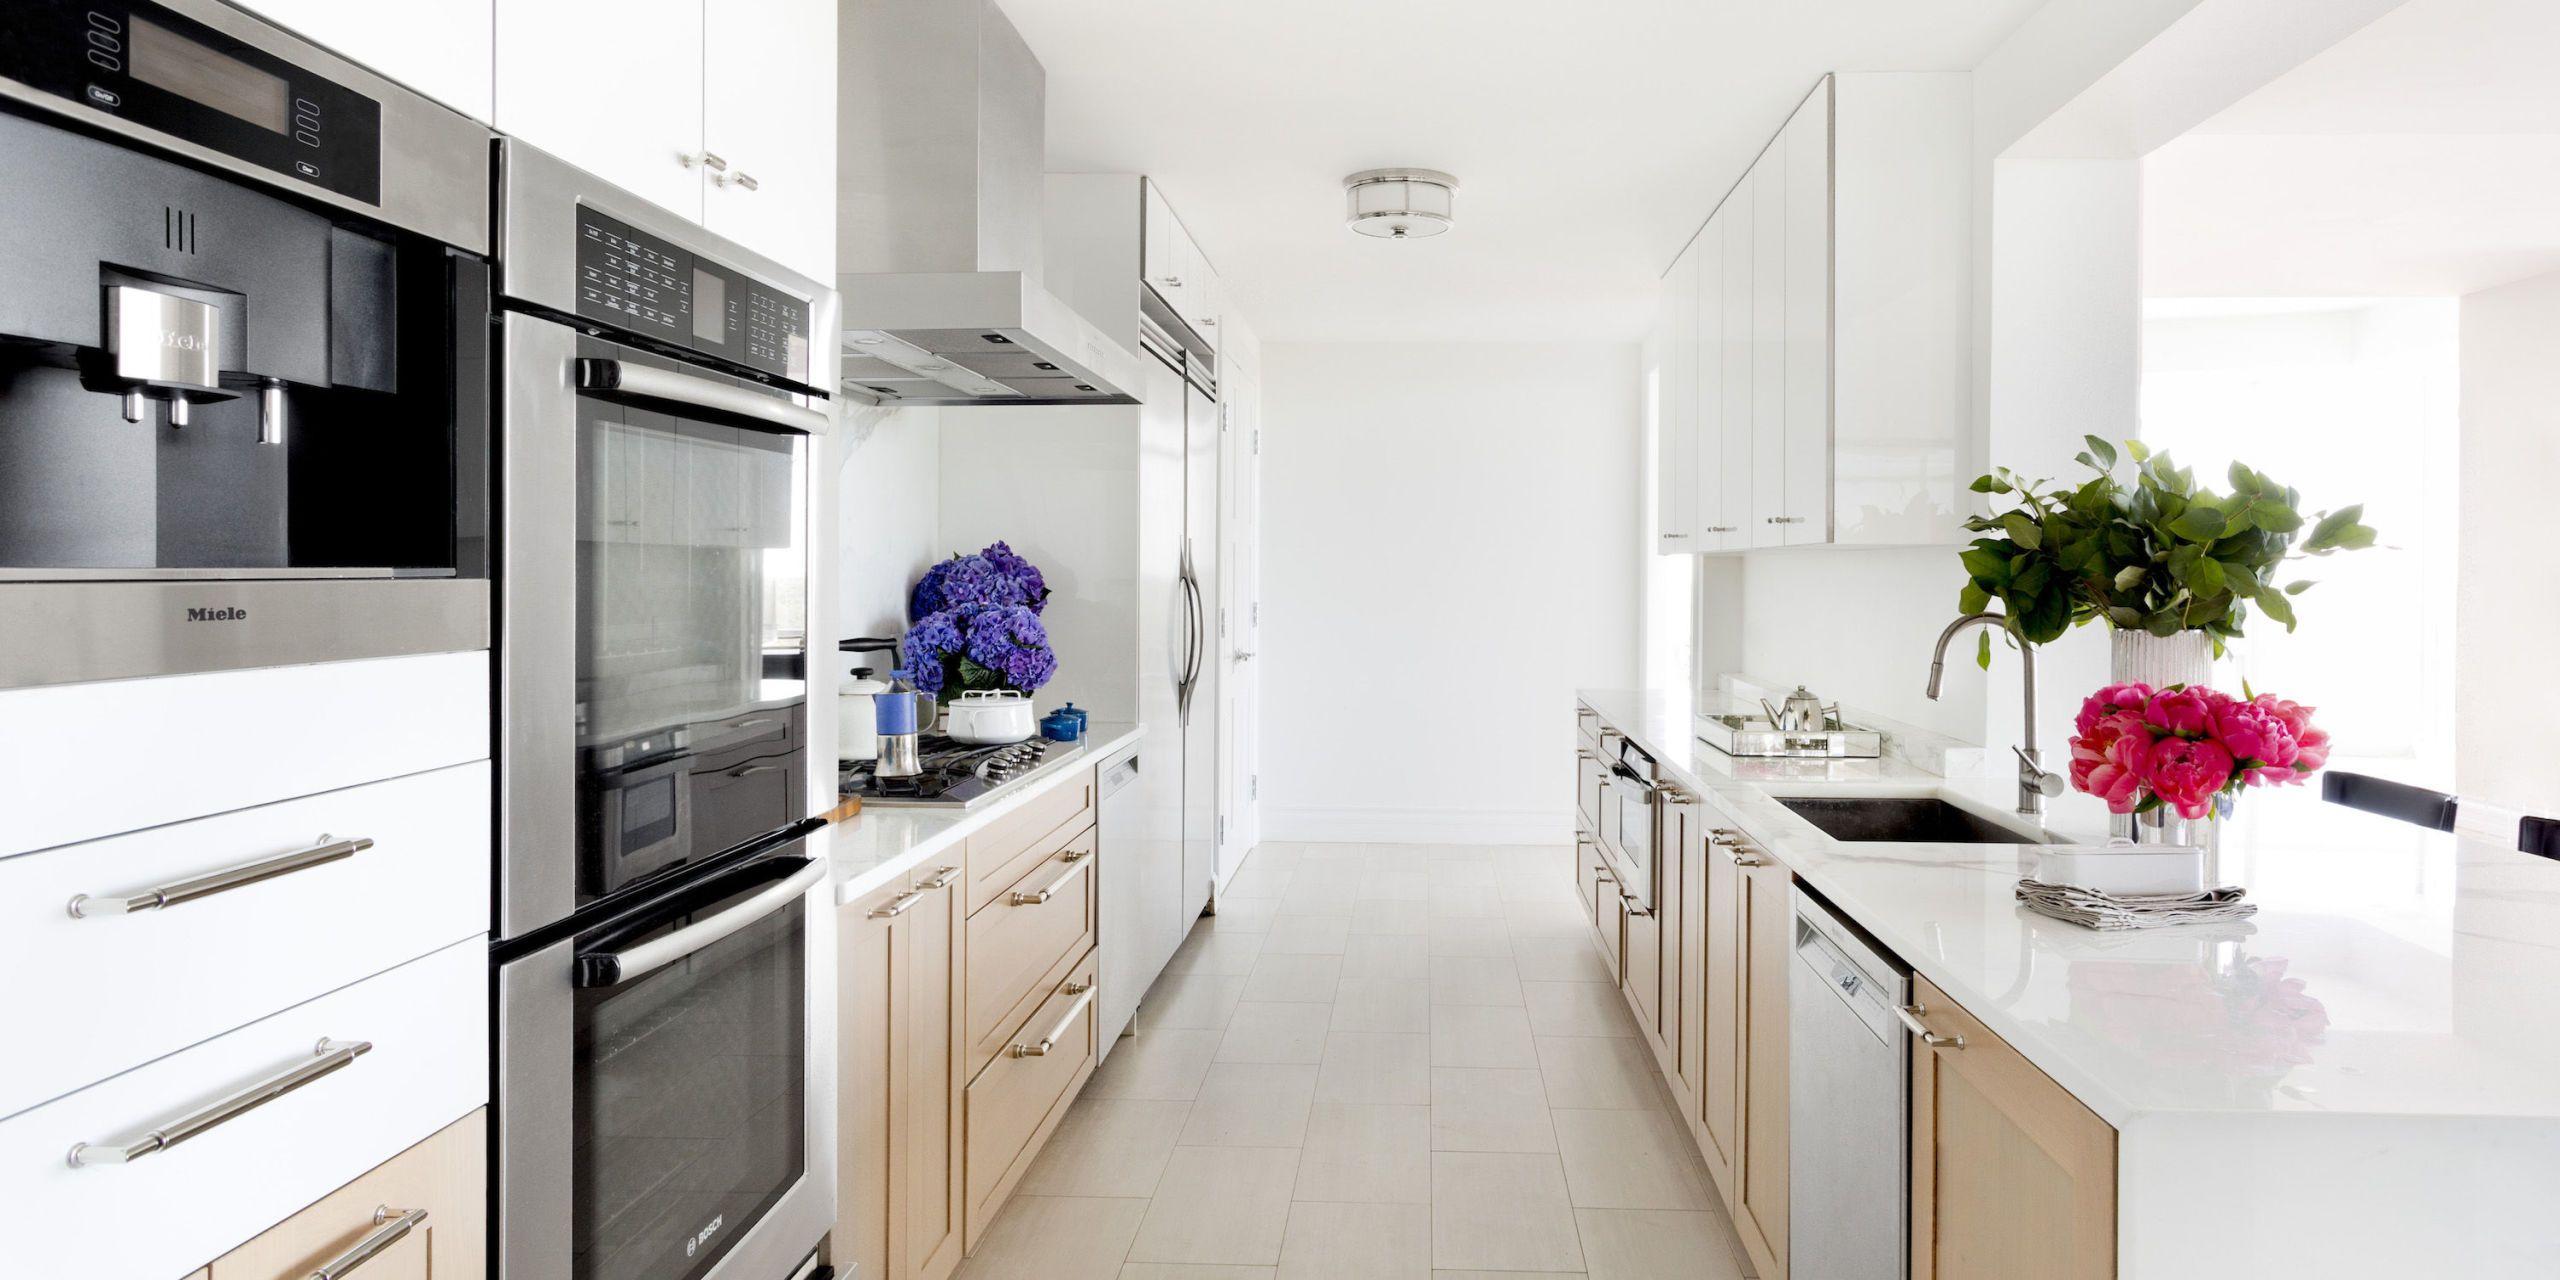 image & 60+ Best Marble Countertops - Modern Kitchen Design